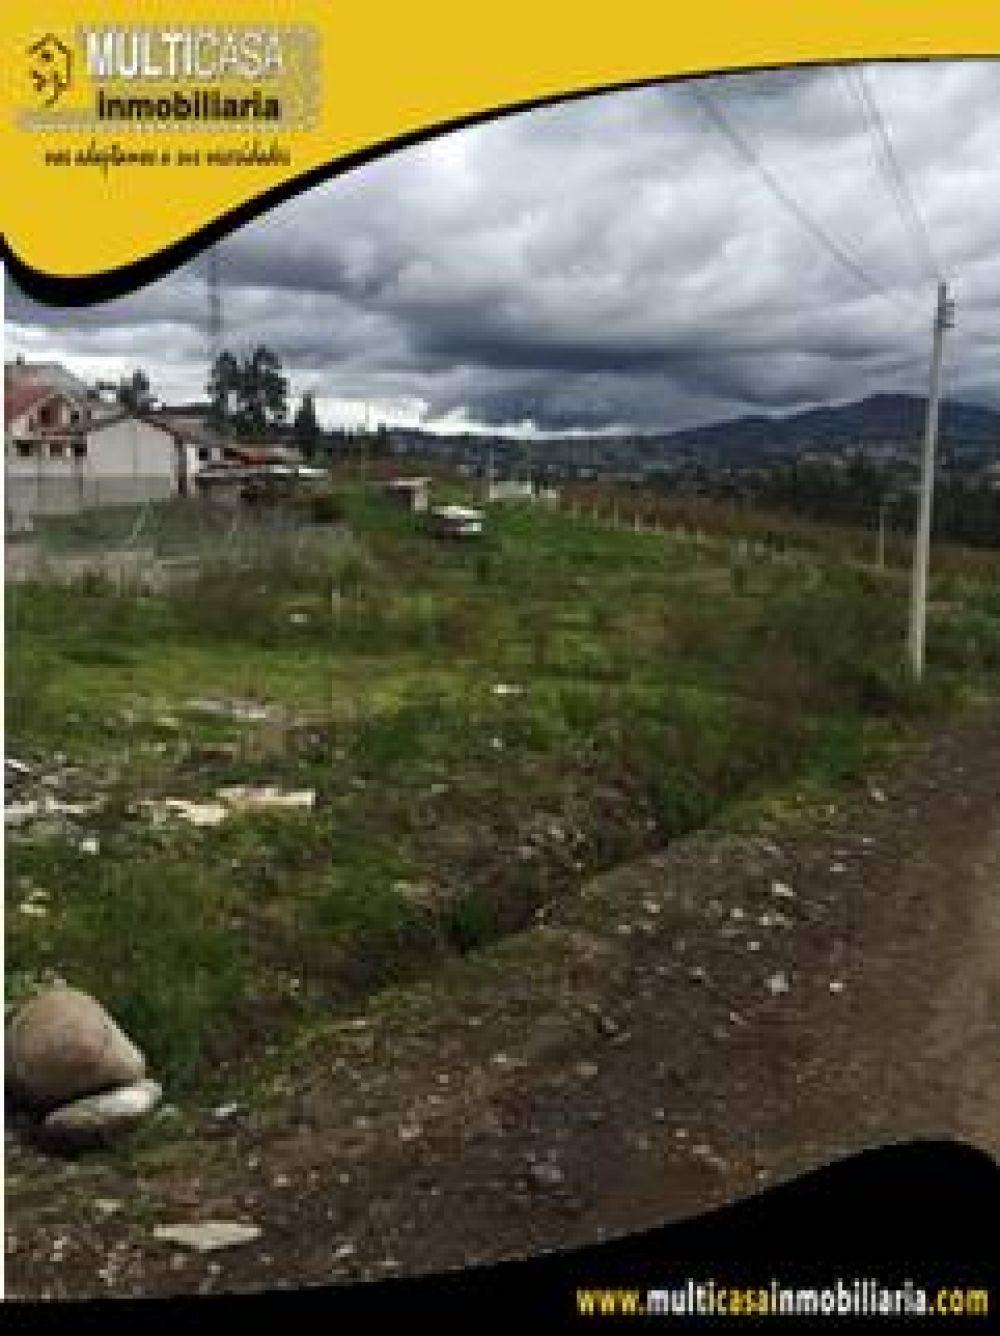 Venta de Hermoso Terreno a Crédito plano con buen Frente listo para construir Sector Monay-Baguanchi Cuenca-Ecuador